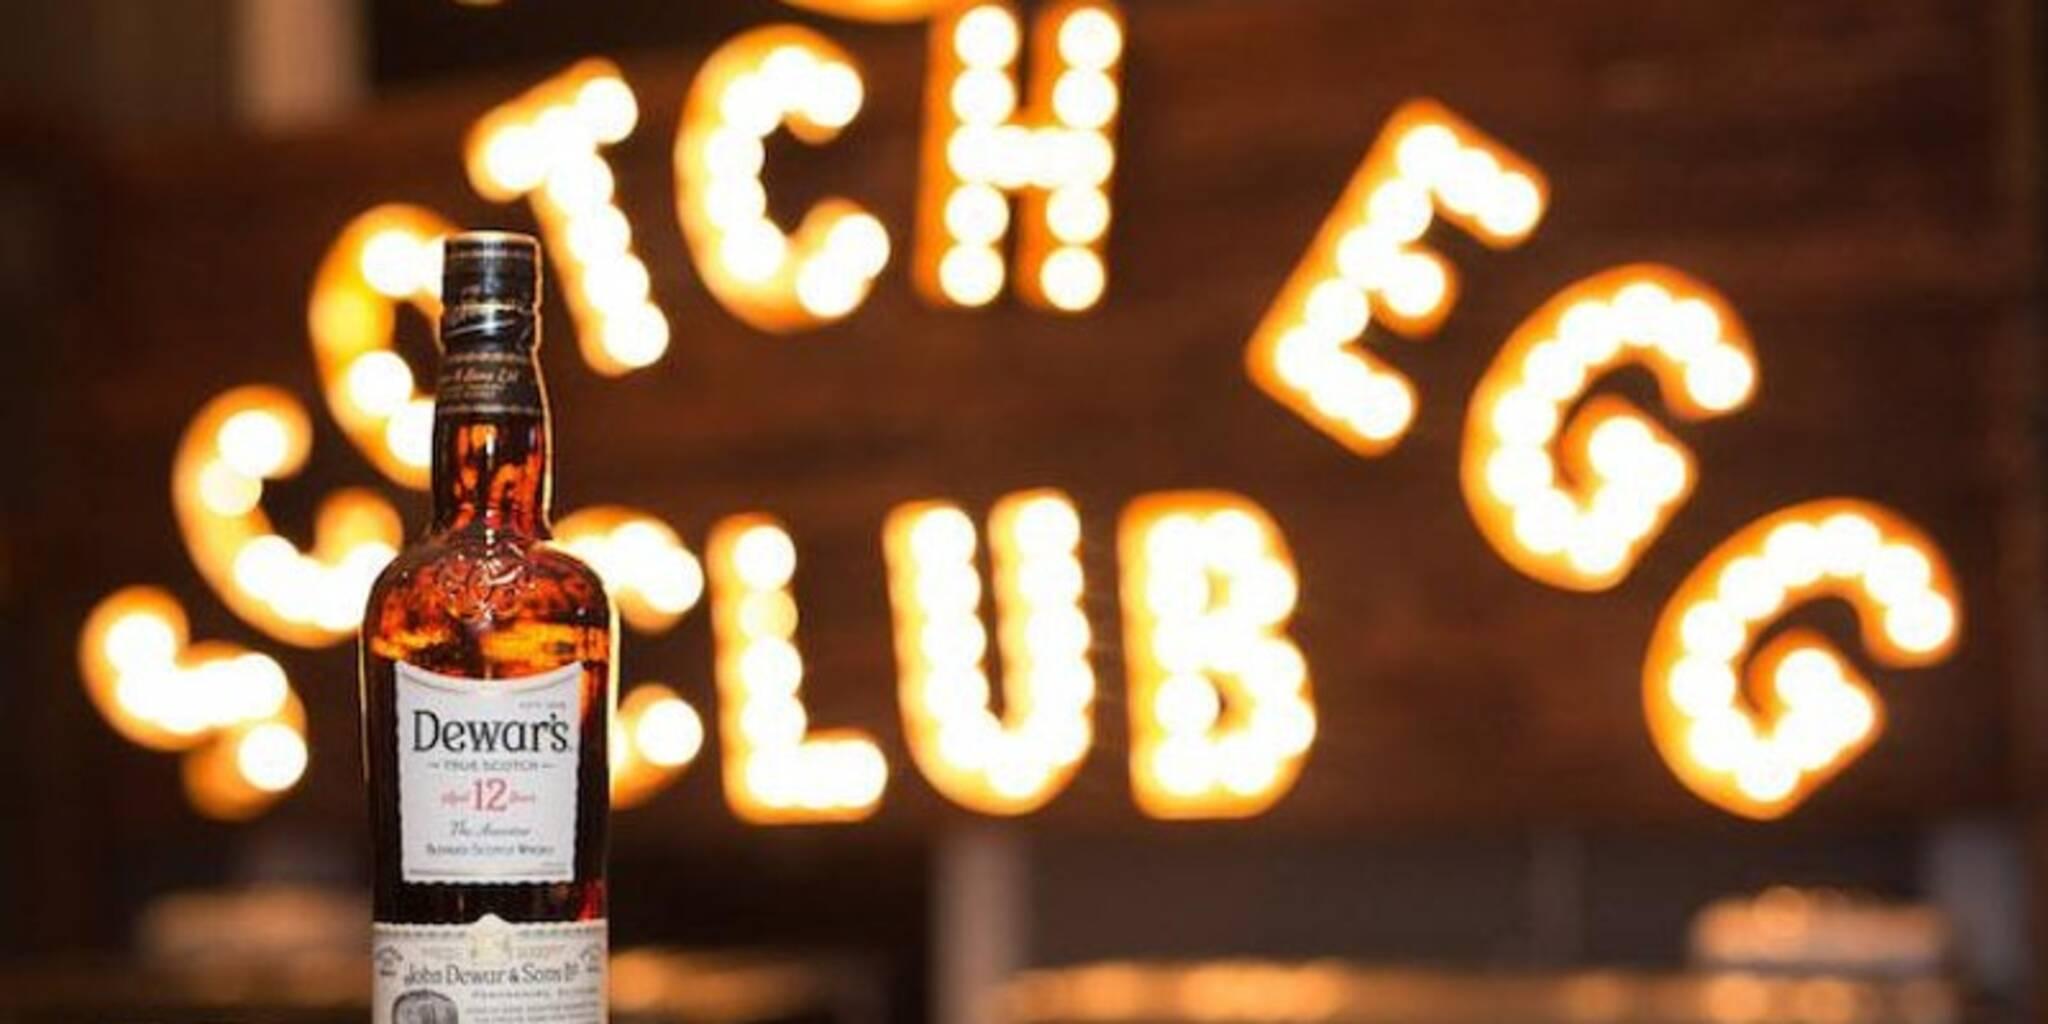 Celebrate Robbie Burns Day at the Dewar's Scotch Egg Club